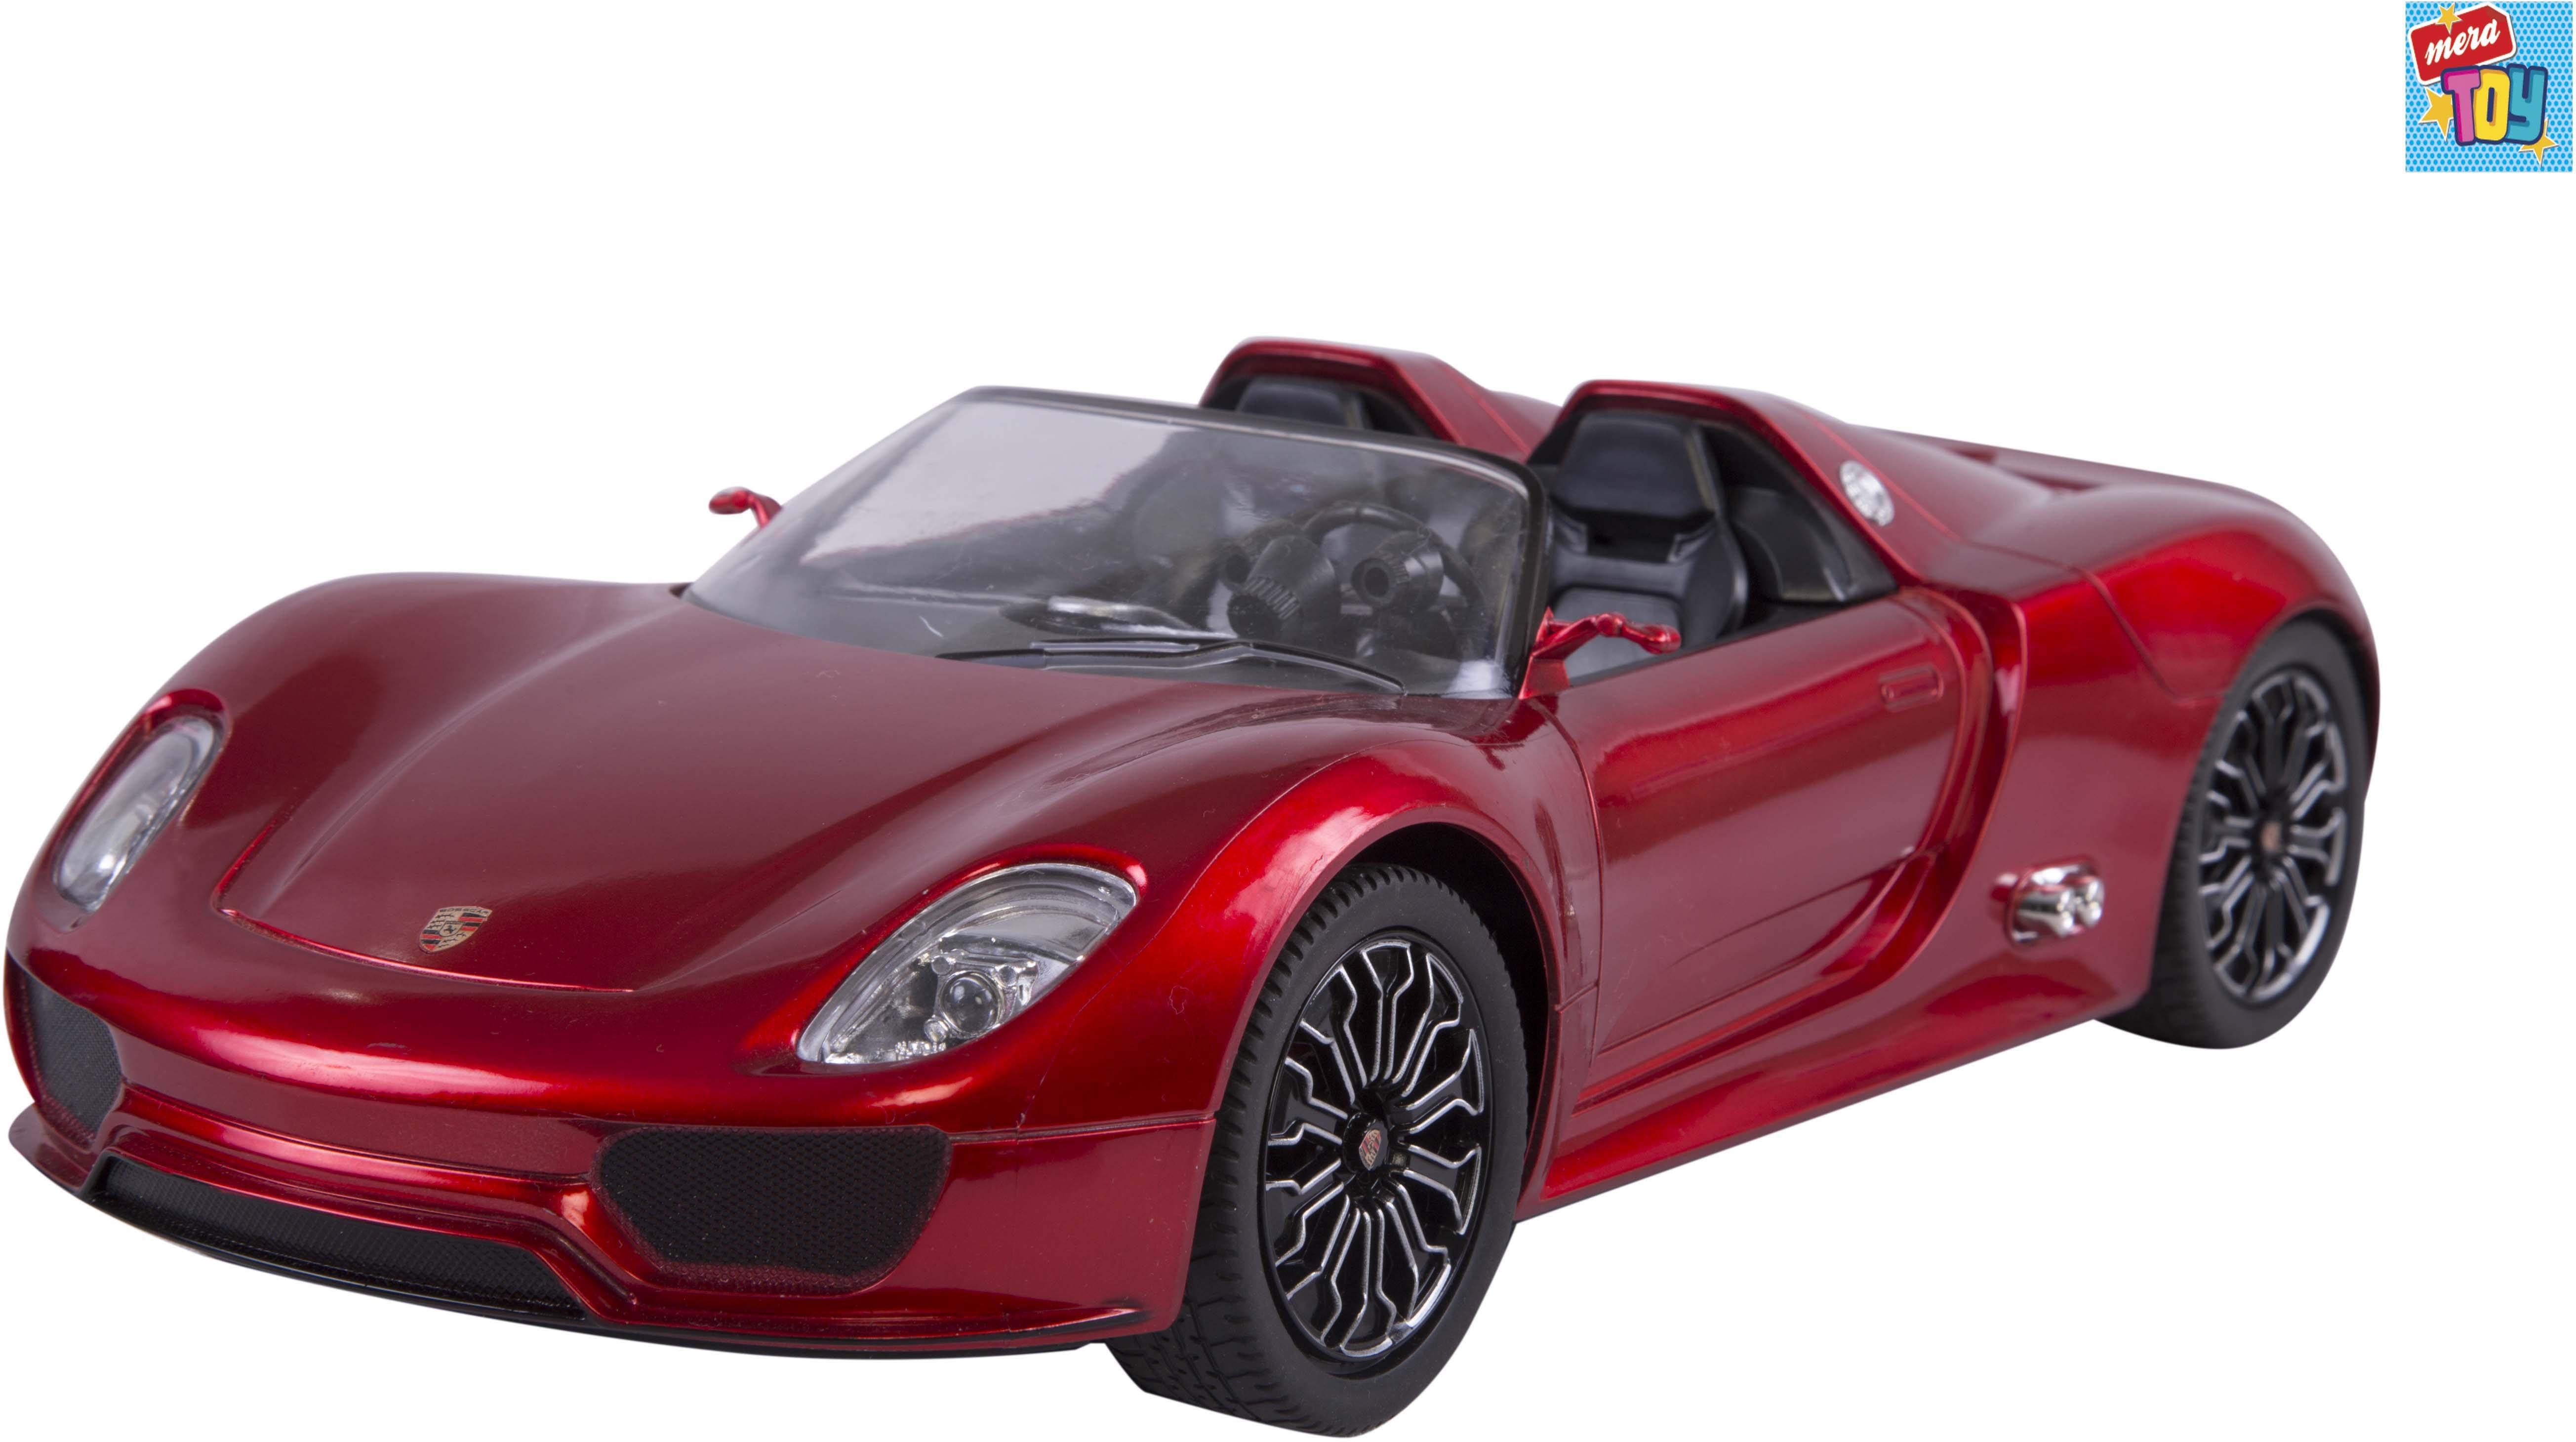 mera-toy-shop-r-c-1-14-porsche-918-spyder-red-original-imae9mbzyfbfuhts Fascinating Porsche 918 Spyder Fiyat Listesi Cars Trend